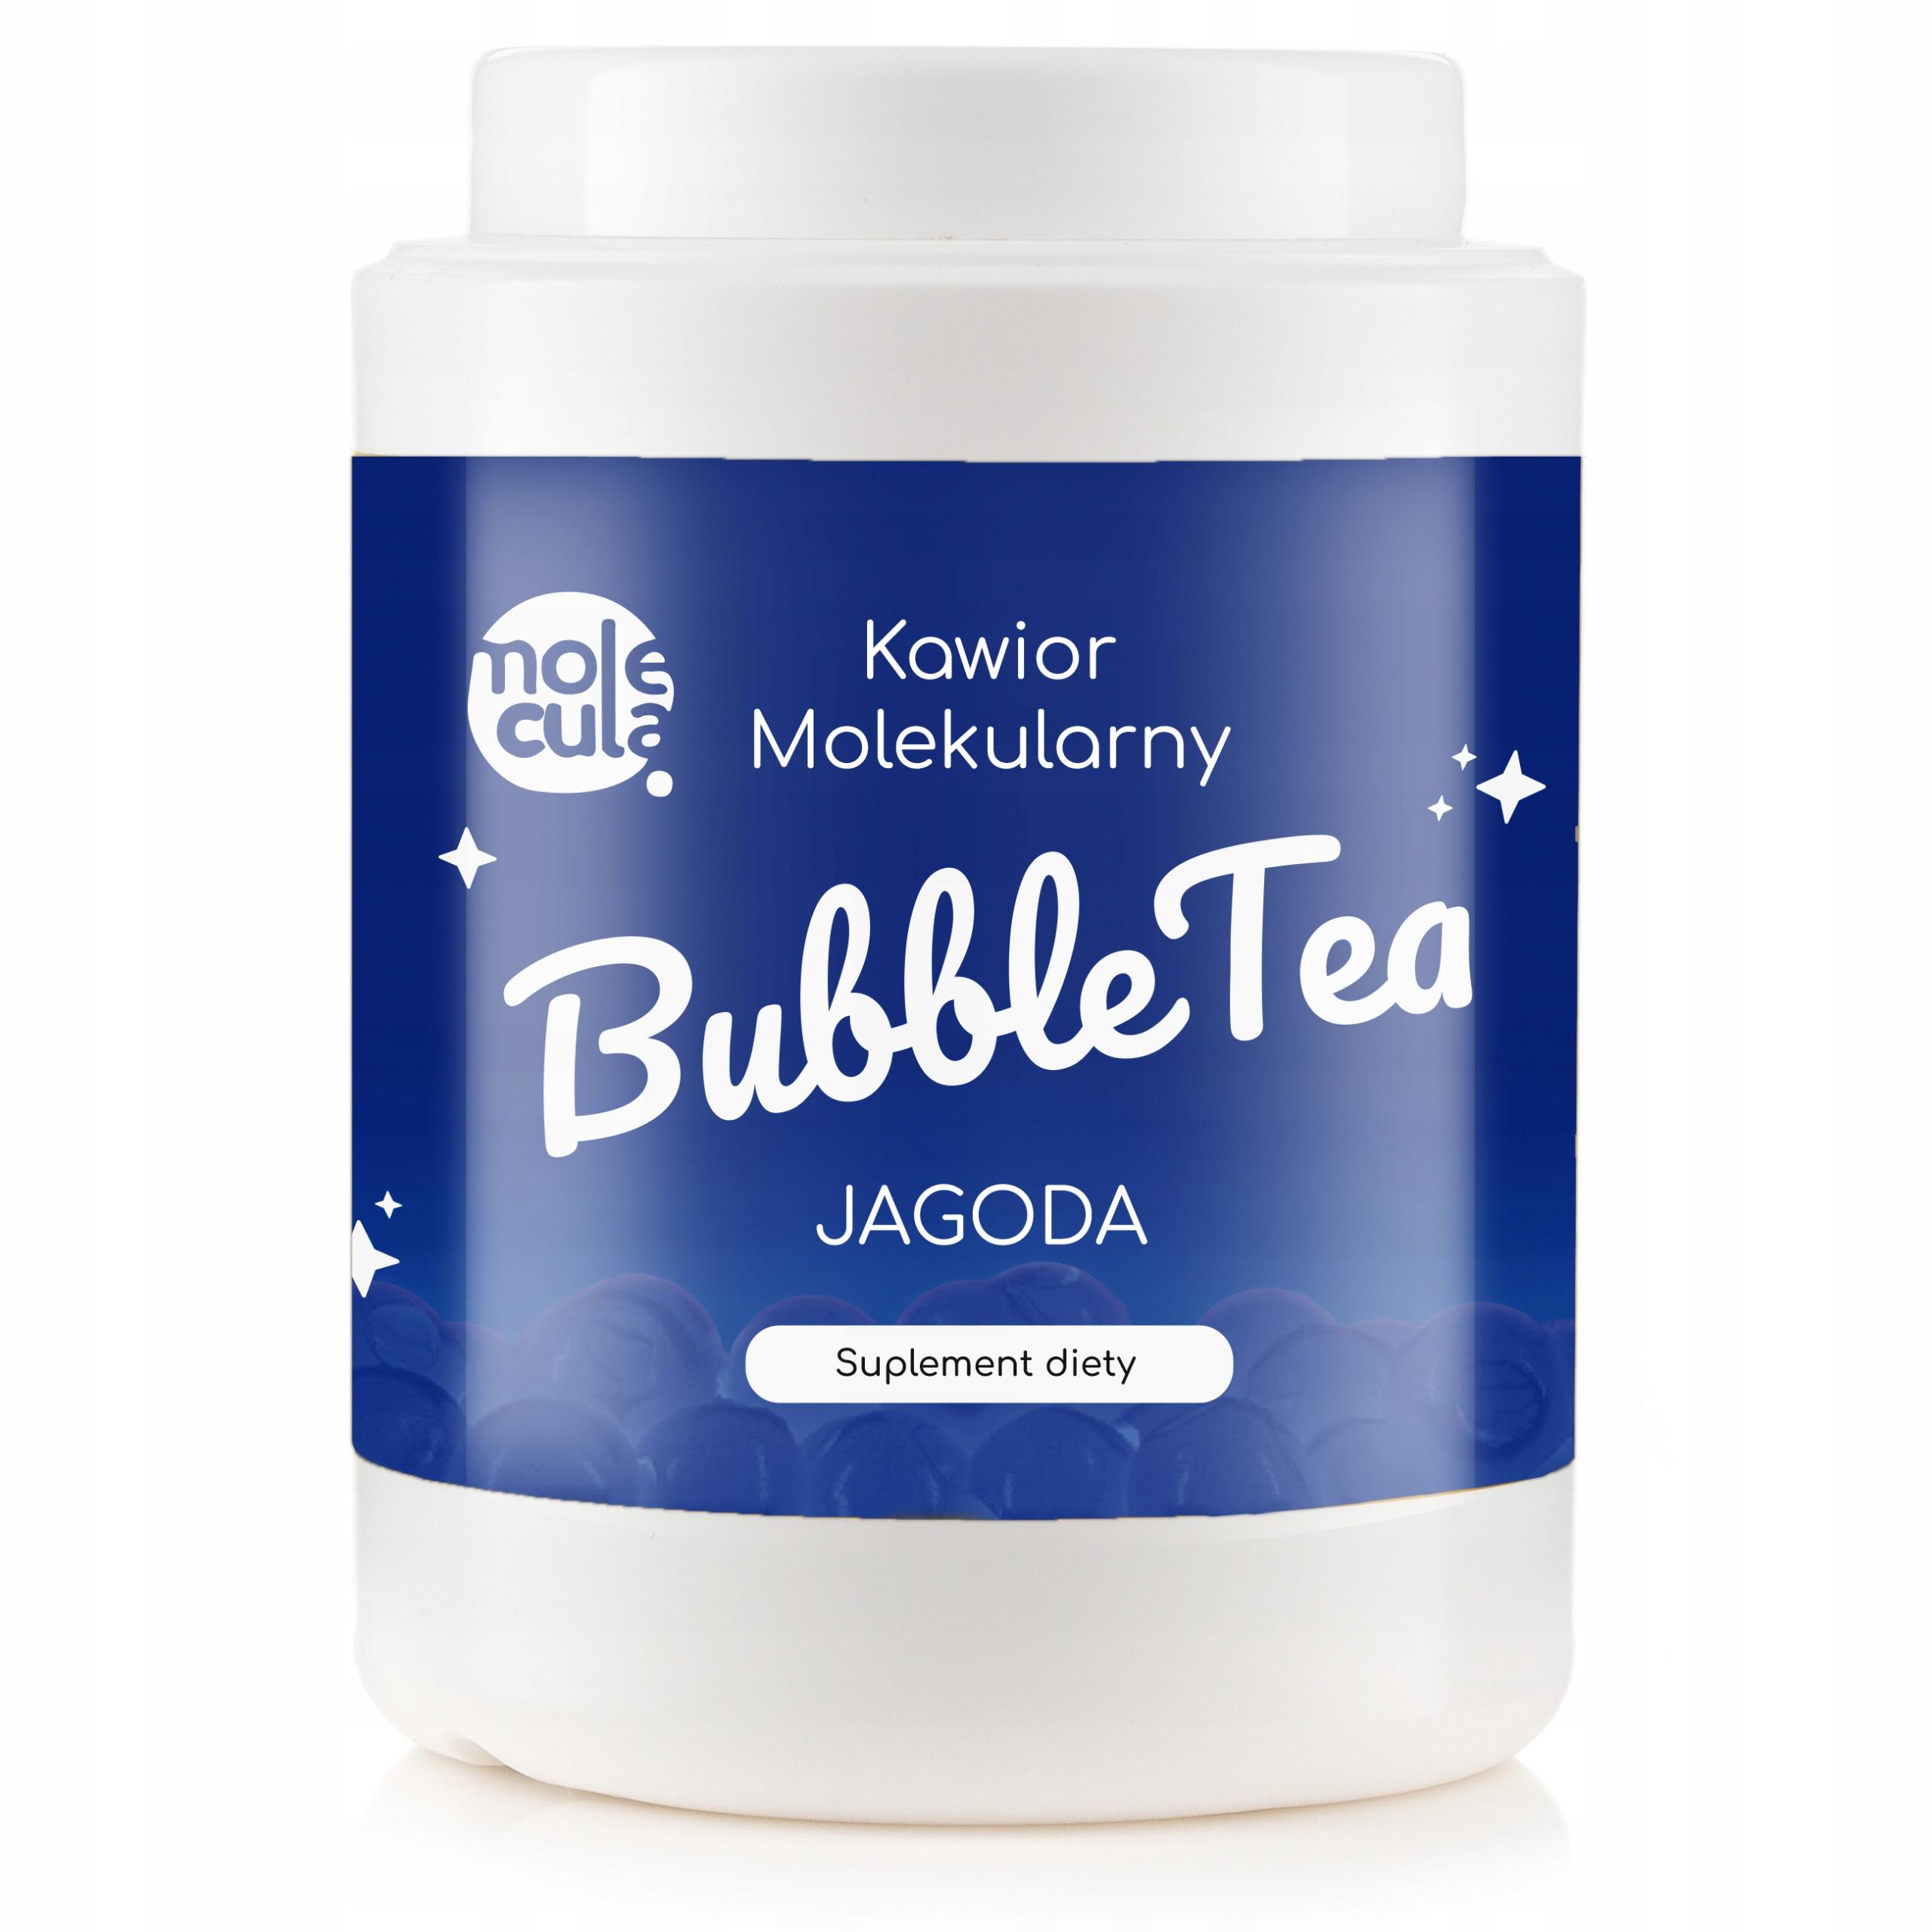 Пузырьковый чай BBs Molecular Caviar 2 KG BLUEBERRY